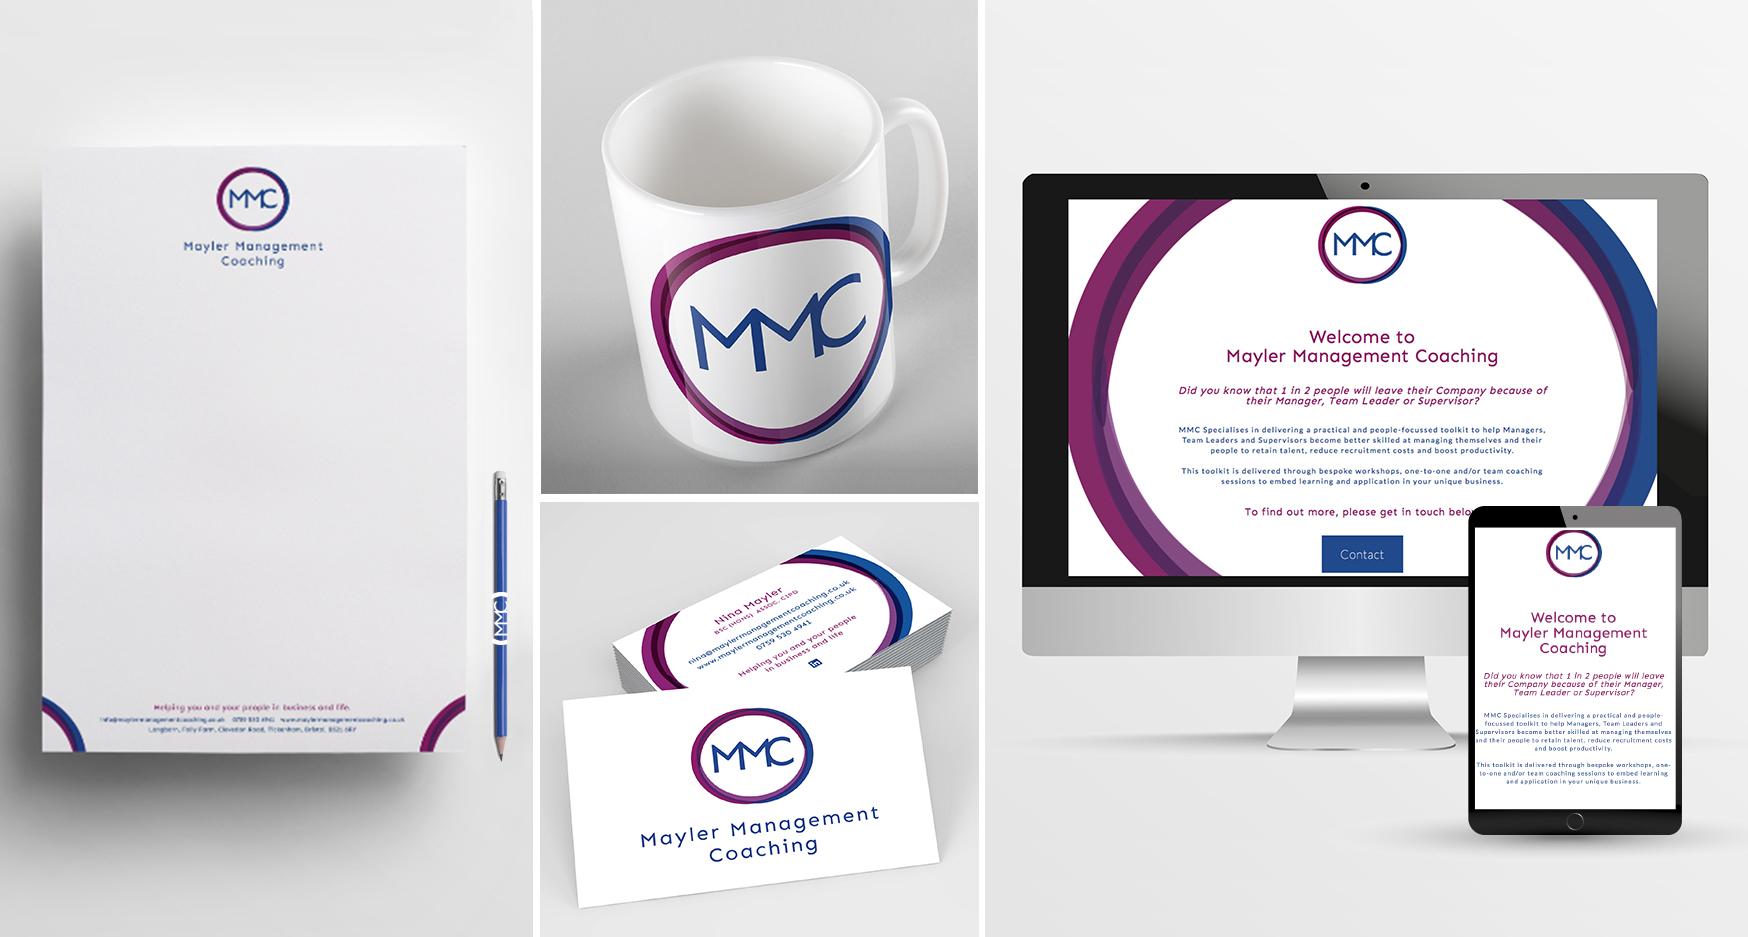 MMC Group.jpg